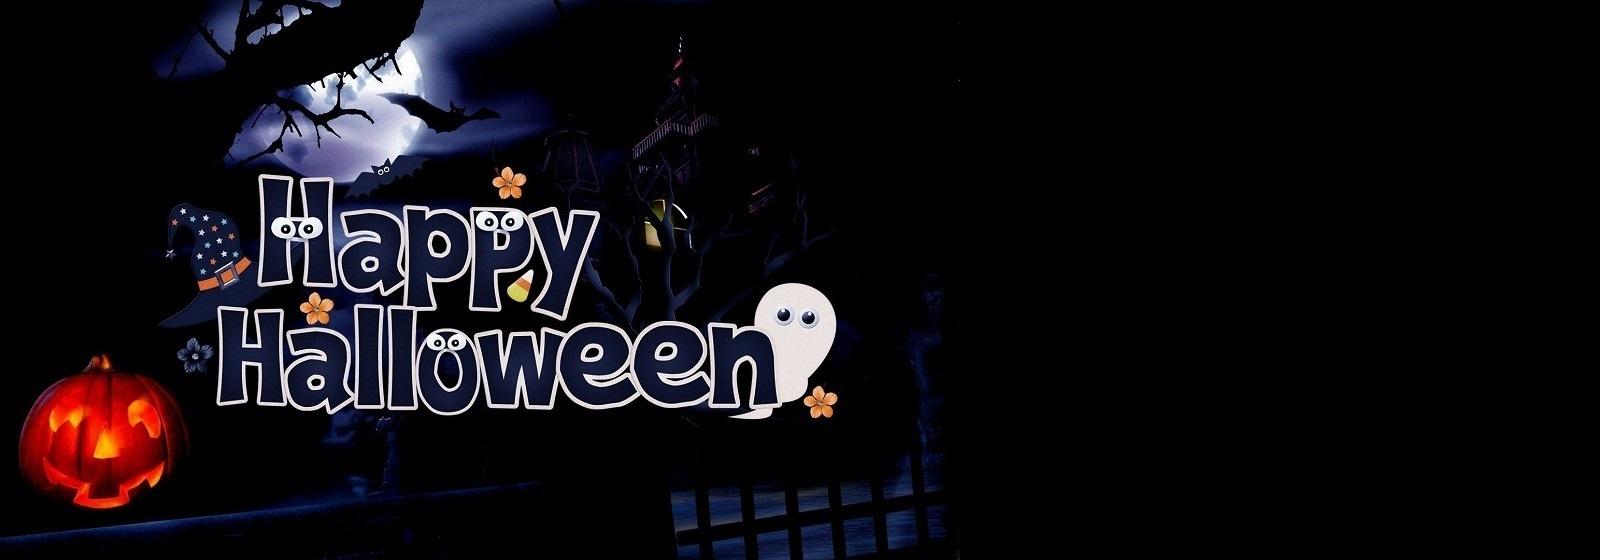 Halloween image slide